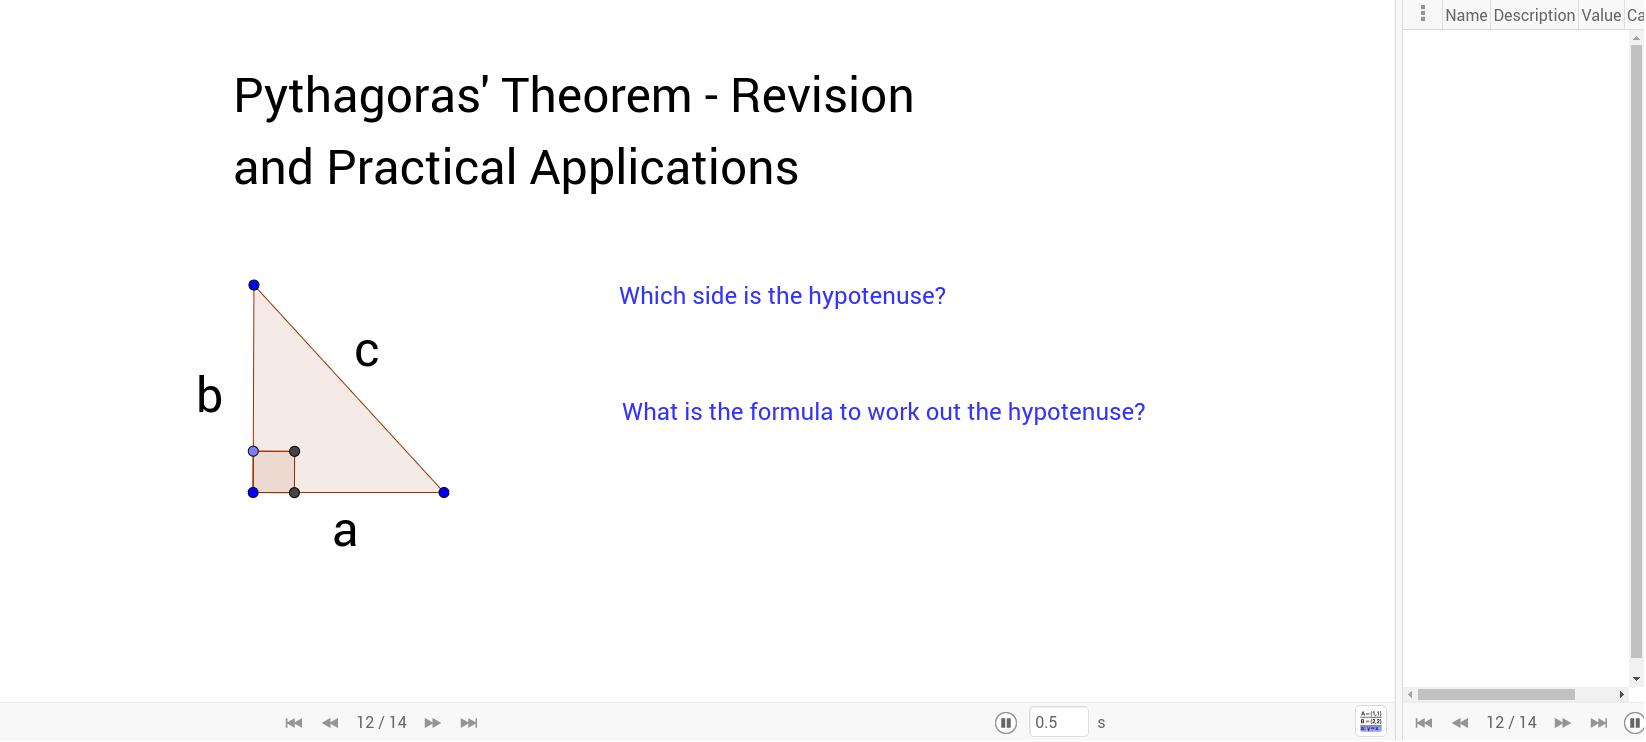 pythagoras theorem revision practical applications geogebra. Black Bedroom Furniture Sets. Home Design Ideas